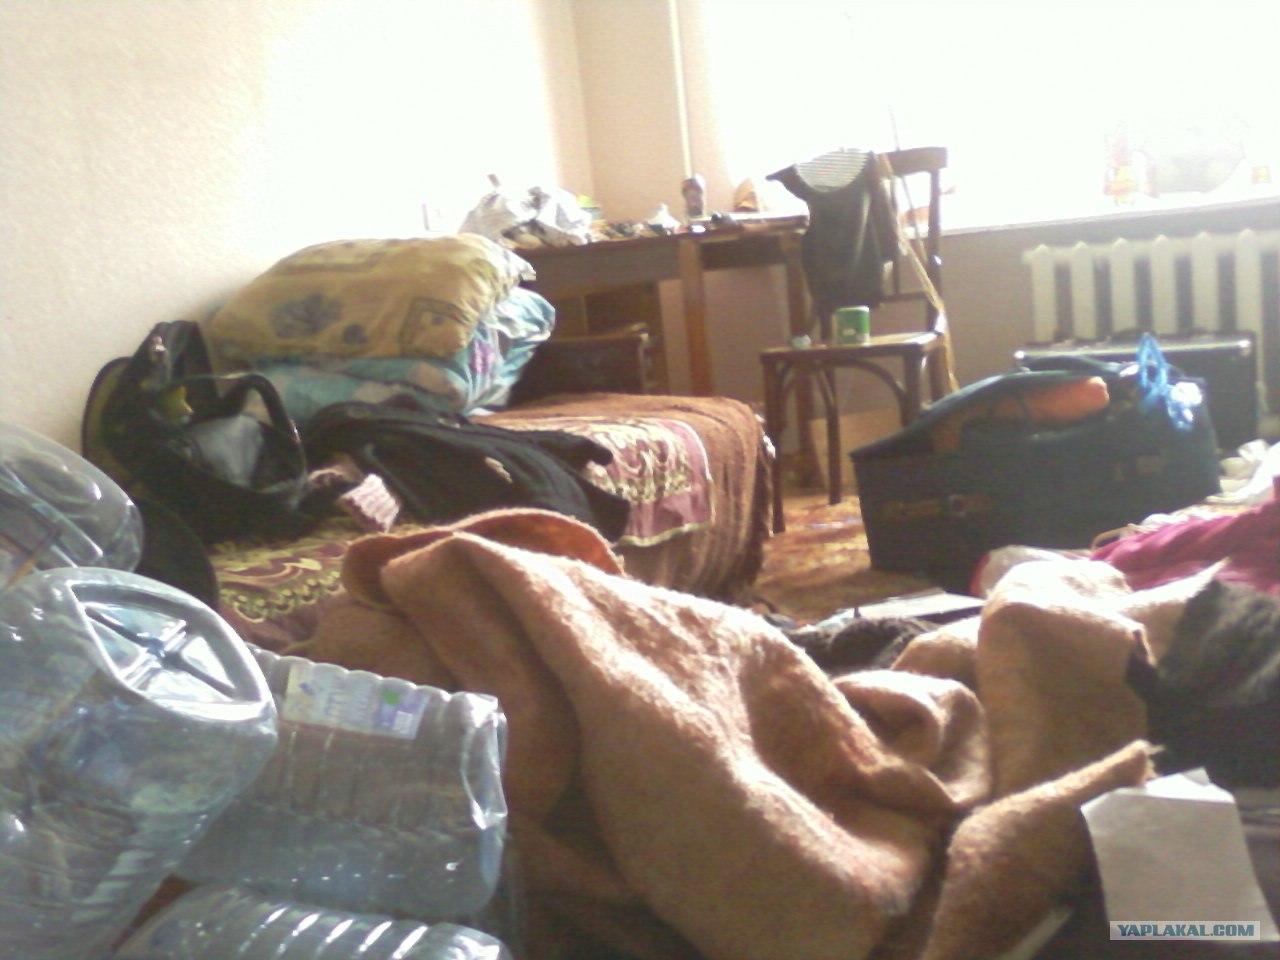 Трахаются на квартиру, Хозяин съемной квартиры снял на скрытую камеру секс 12 фотография